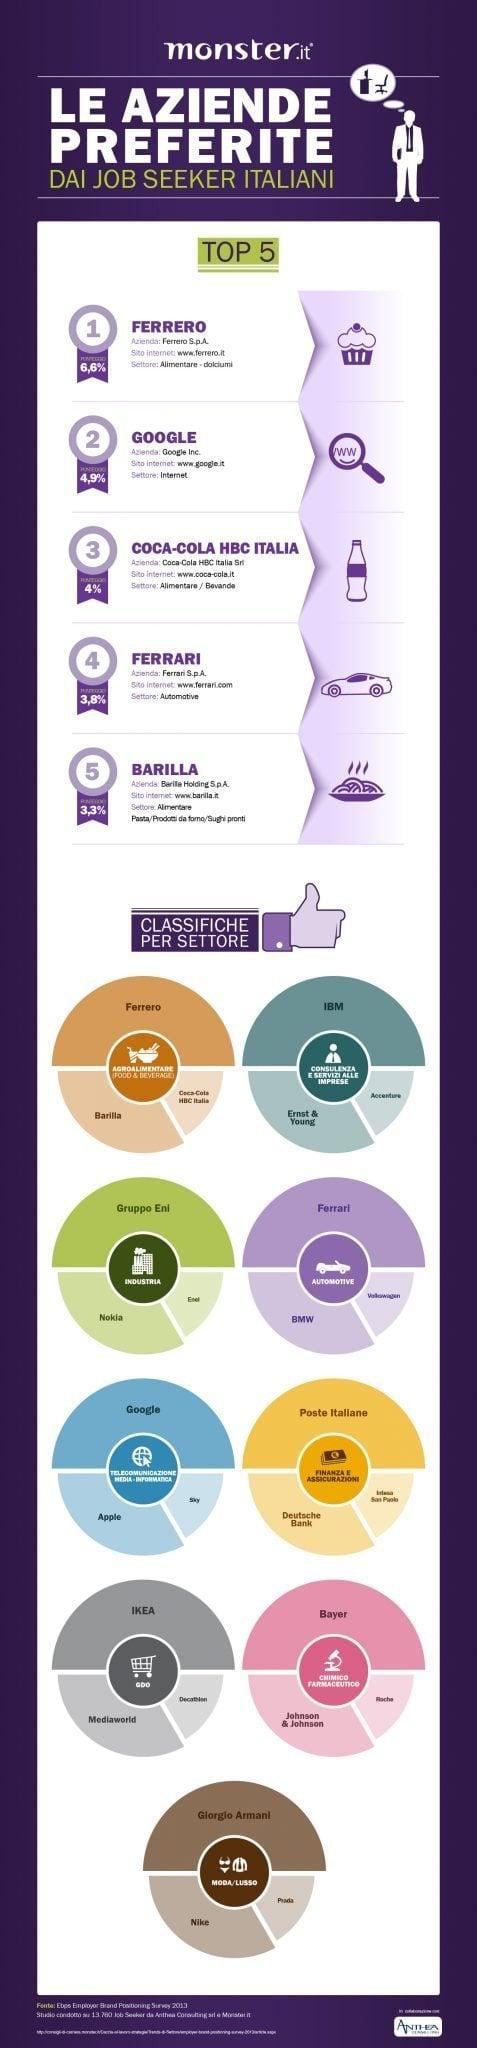 EBPS_Infographic_1_Monster.it